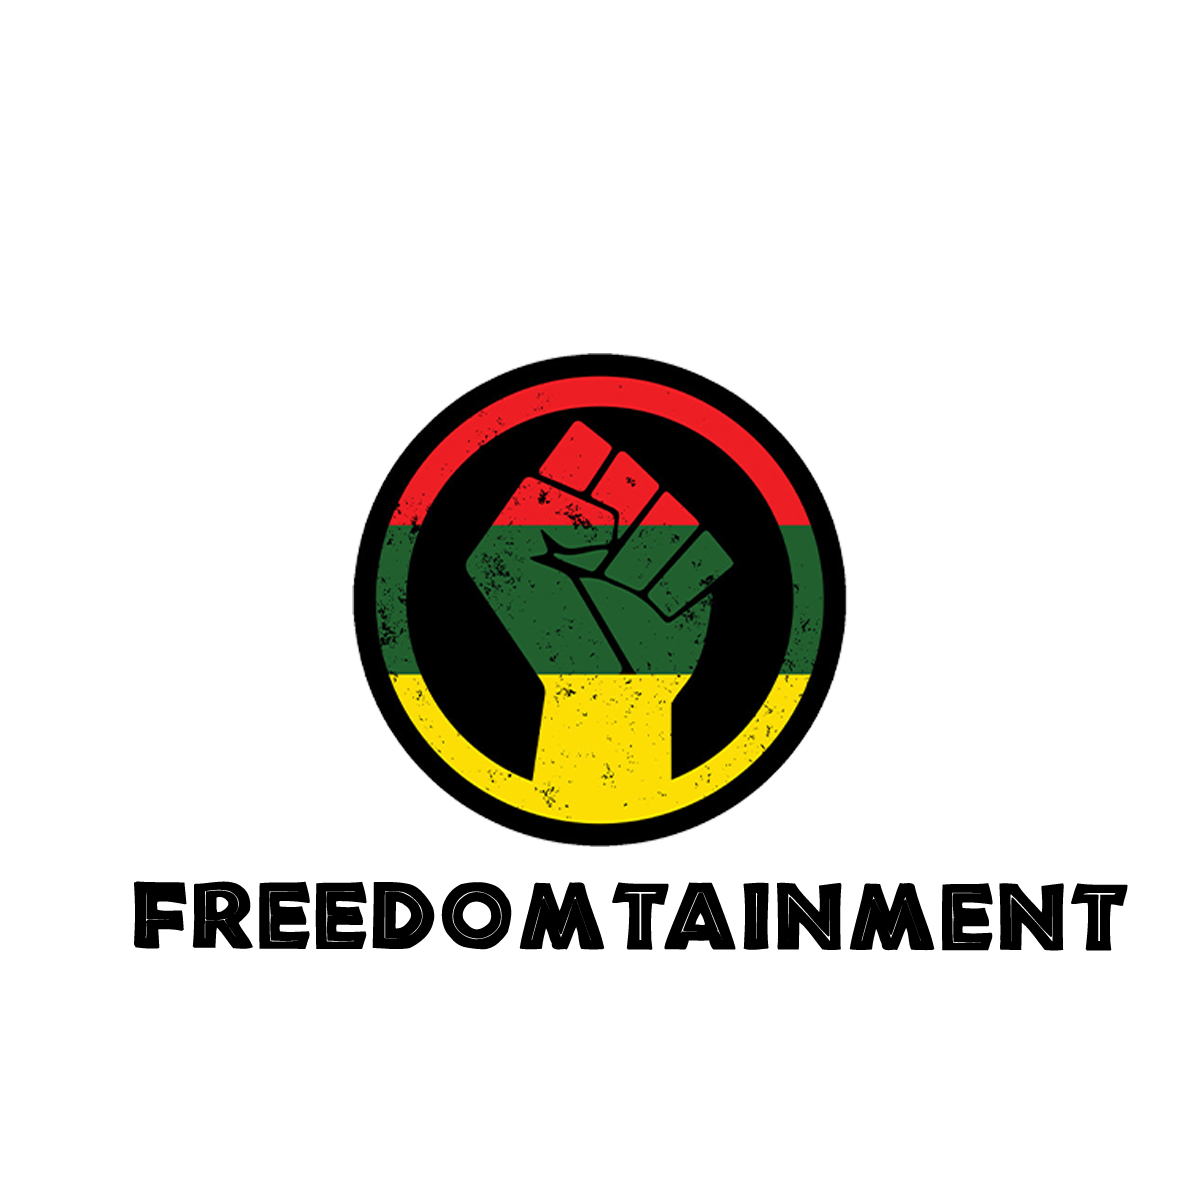 Freedomtainment